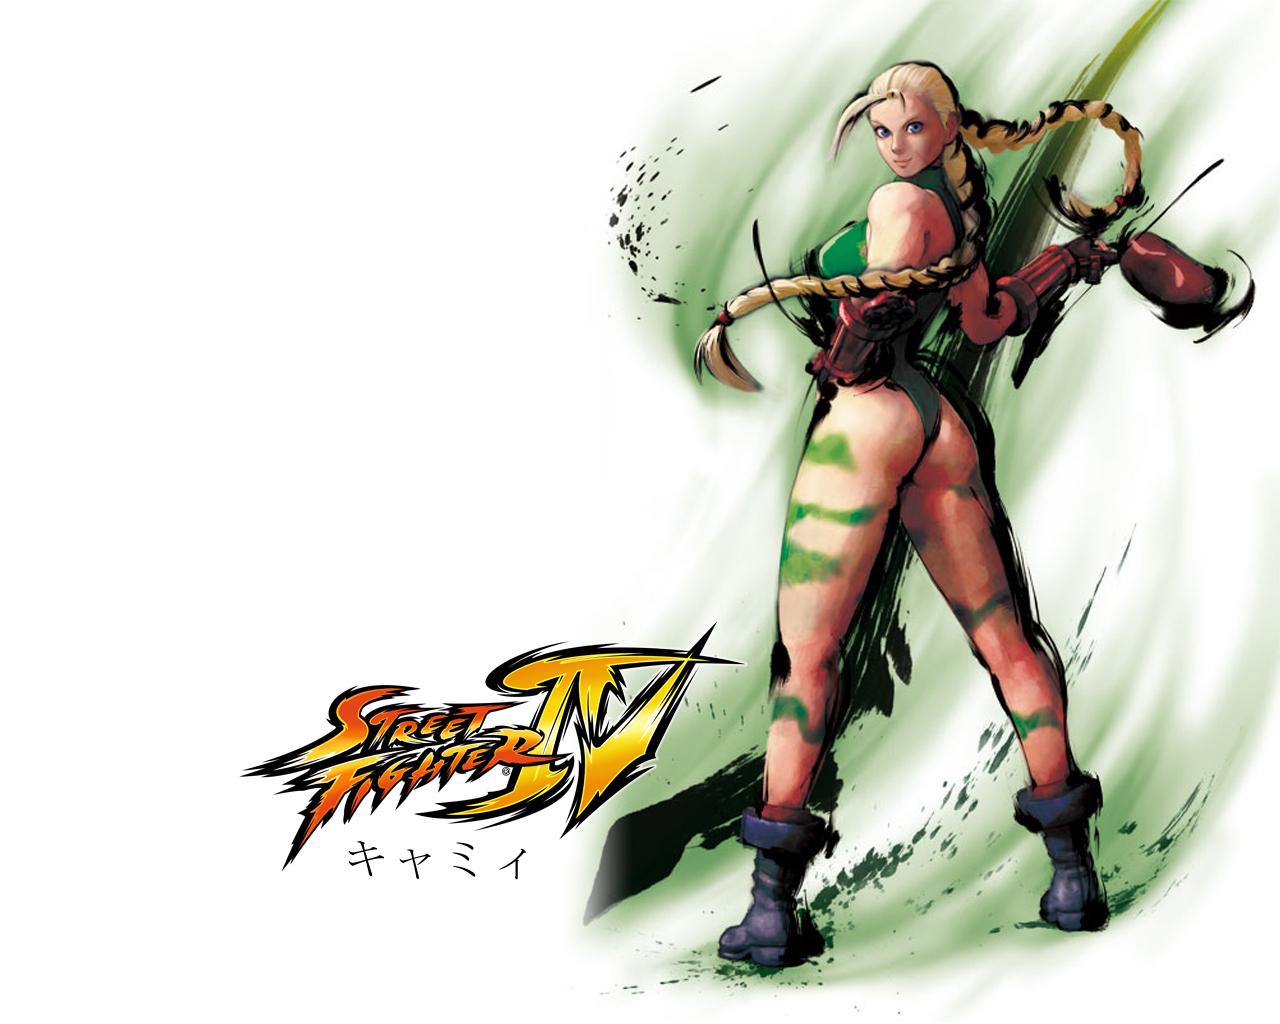 Street Fighter 4 Cammy Wallpaper | Customity